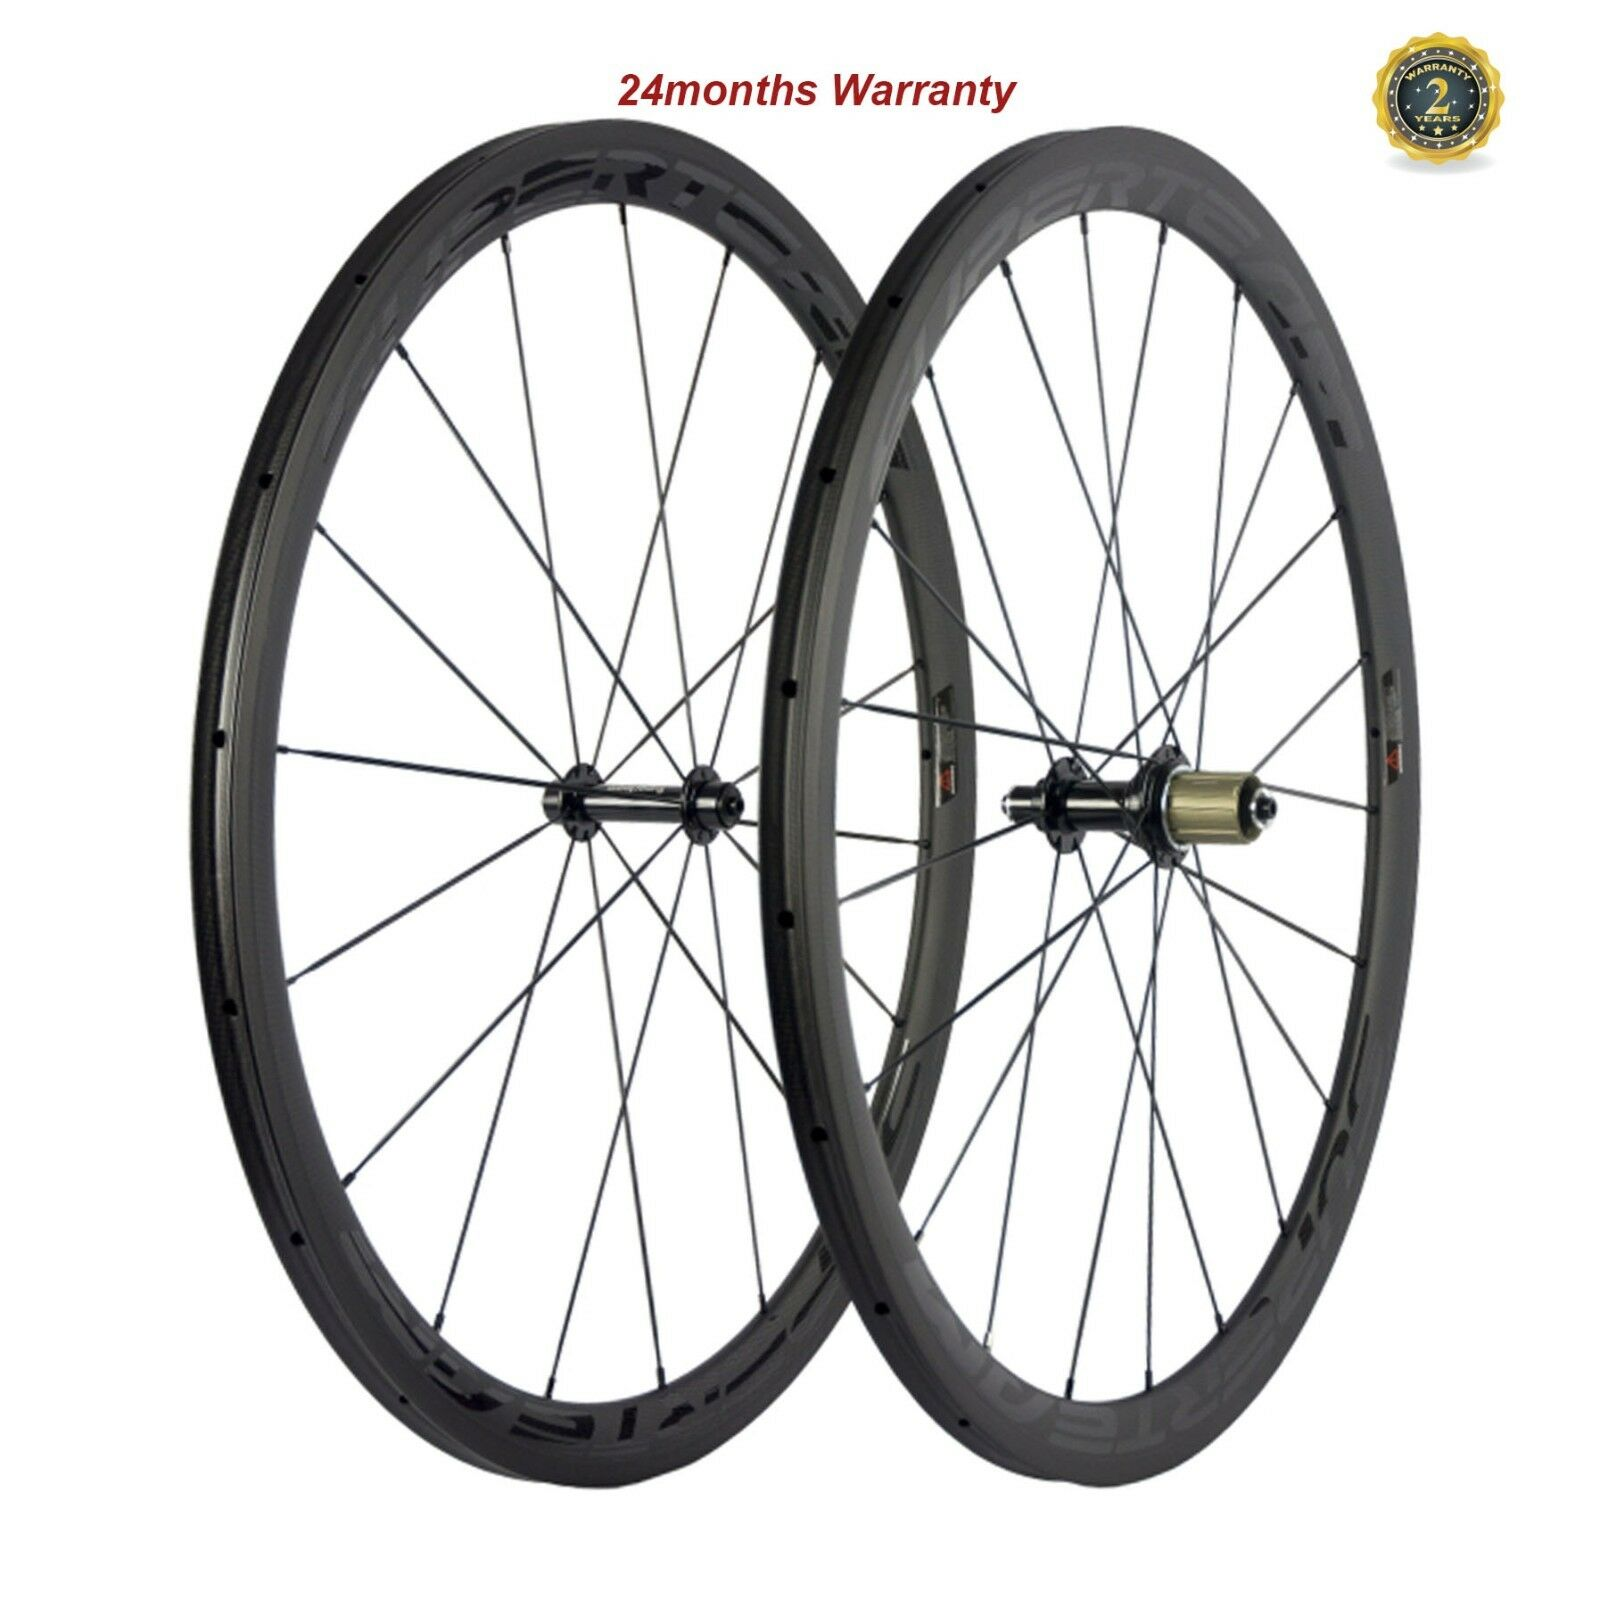 SUPERTEAM  Carbon Fiber Cycling Wheelset 23mm Width 38mm Tubular Wheels R13 Hubs  sales online